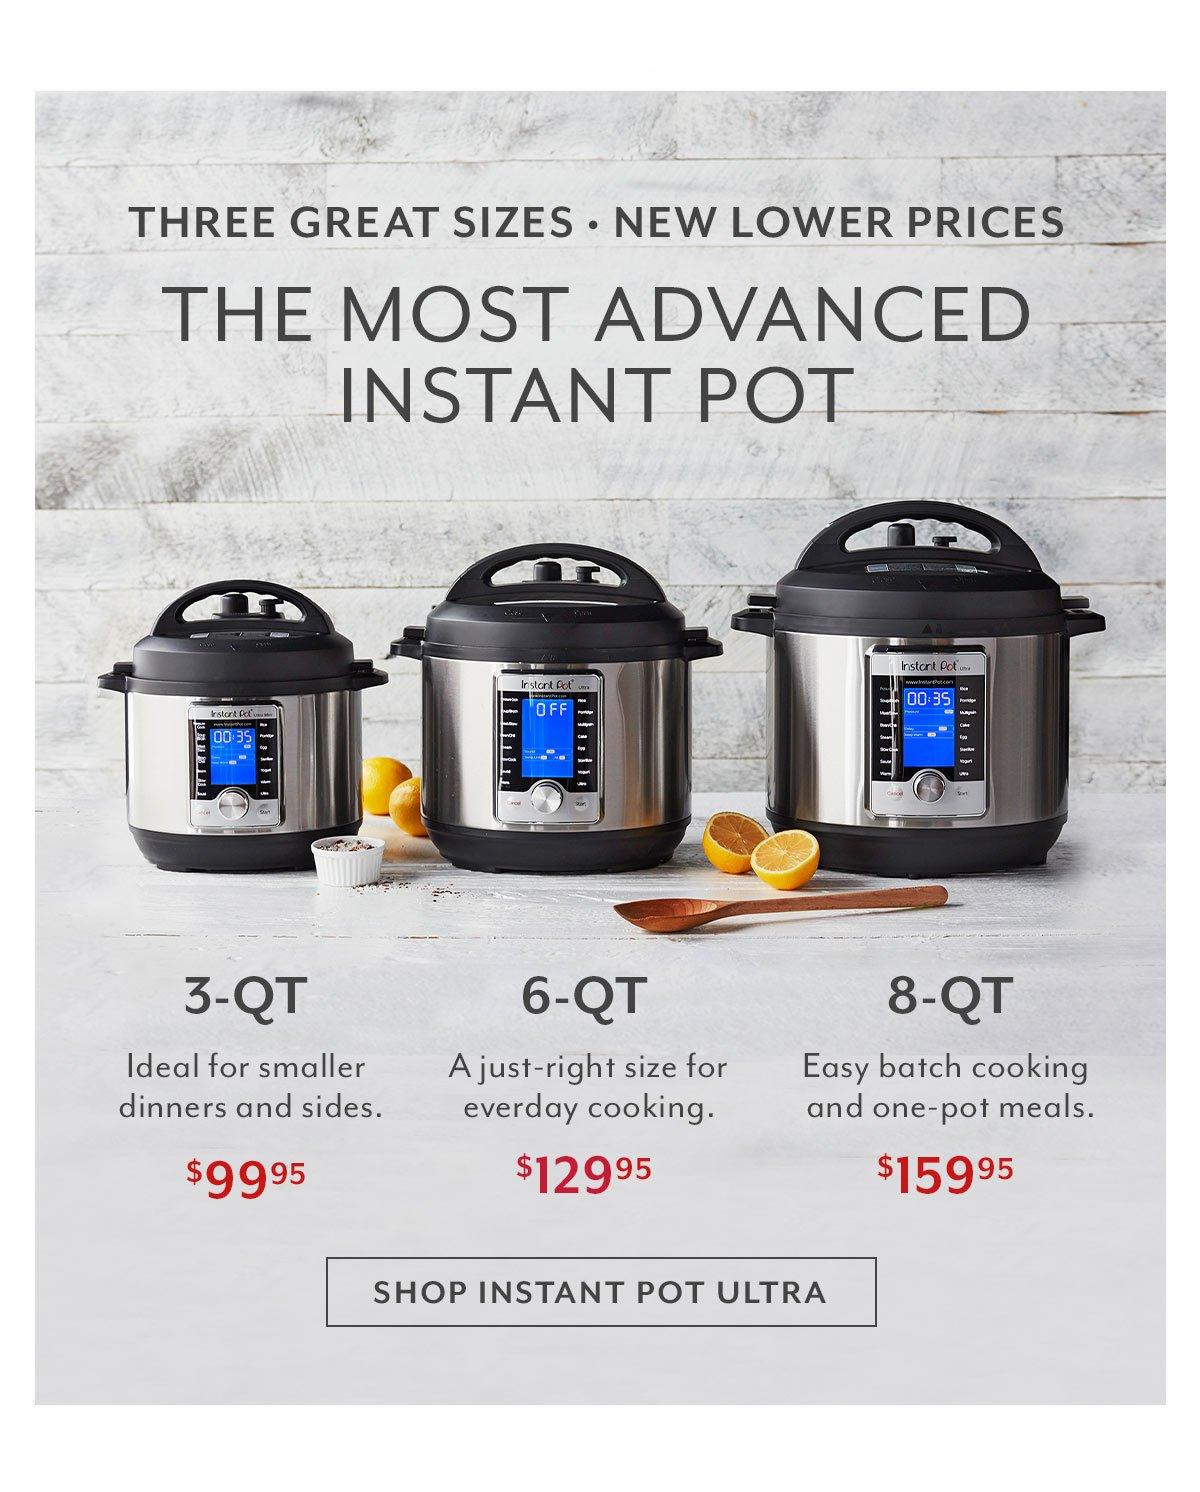 Instant Pot: Three Great Sizes